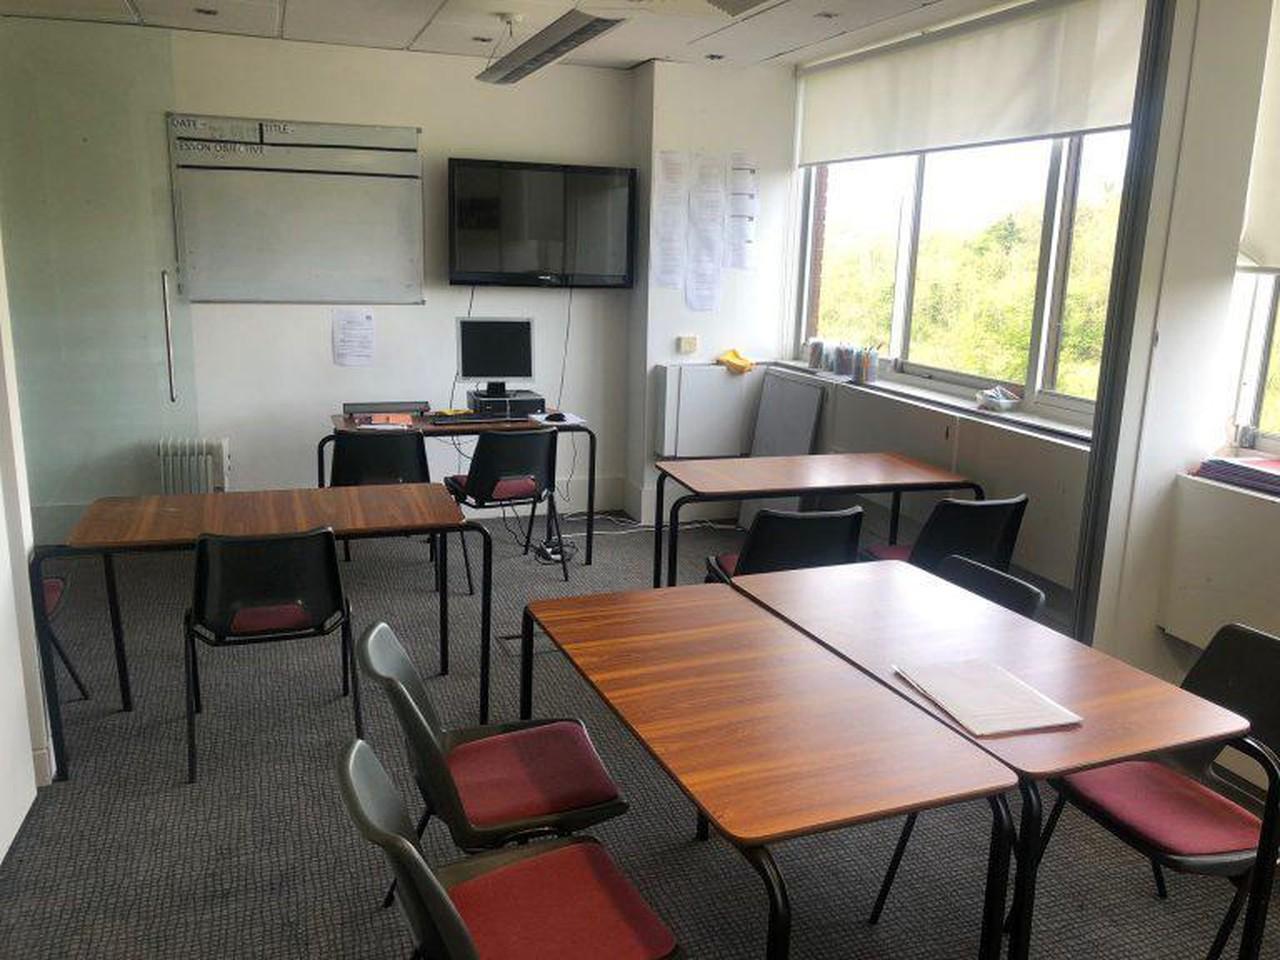 Londen training rooms Vergaderruimte meeting space 3 image 0